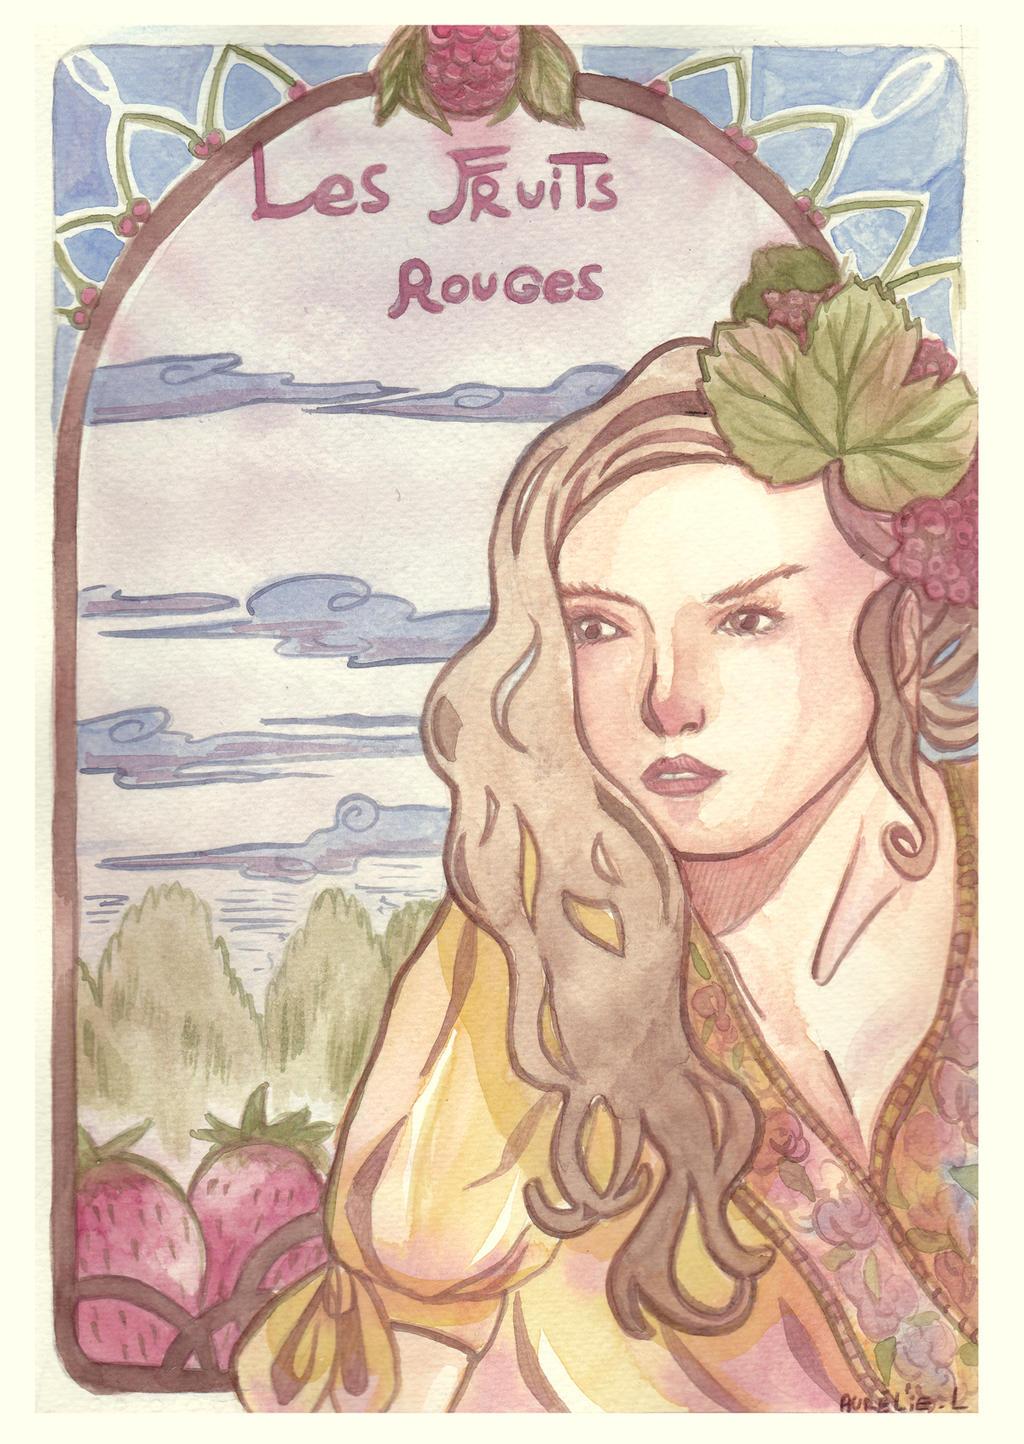 watercolor : Les Fruits Rouges by hiromihana